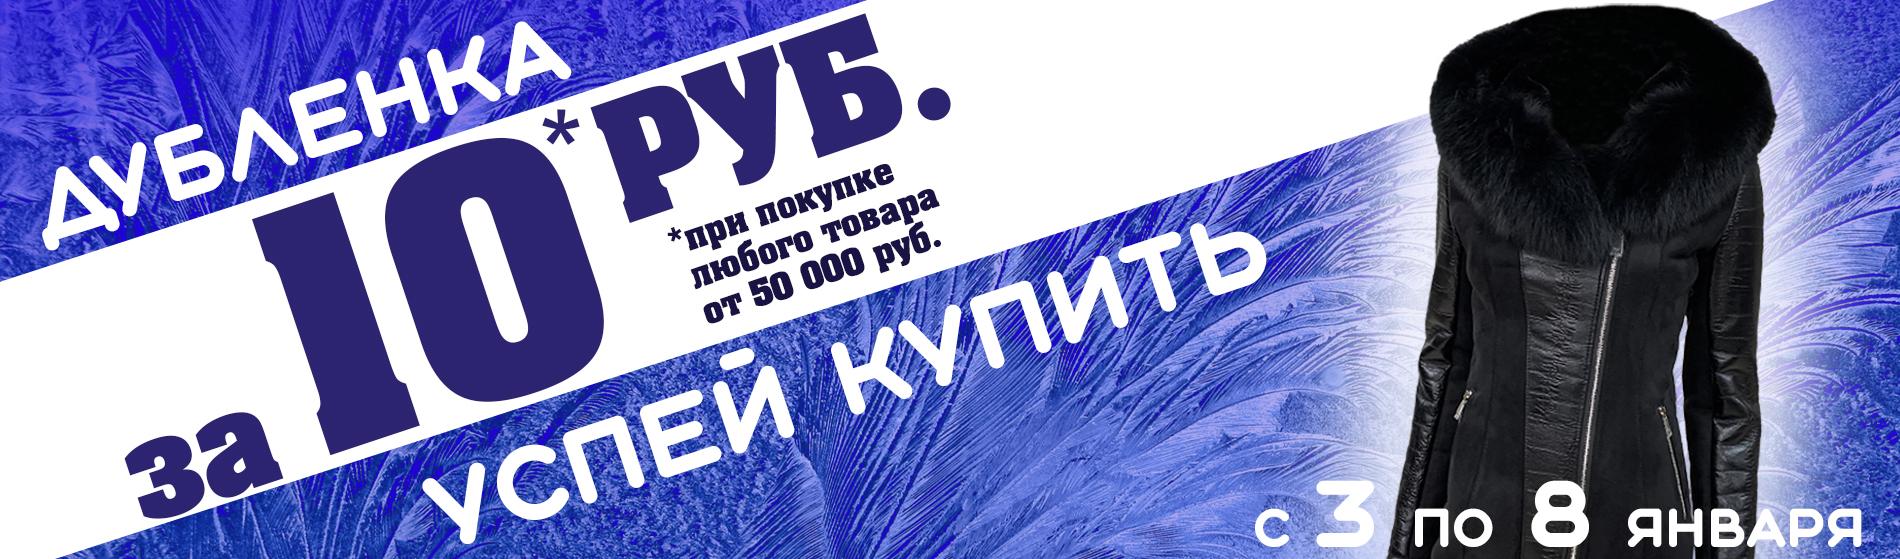 Акция - дубленка за 10 рублей с 3 по 8 января 2020 года в магазинах-салонах кожи и меха ЭЛИТА